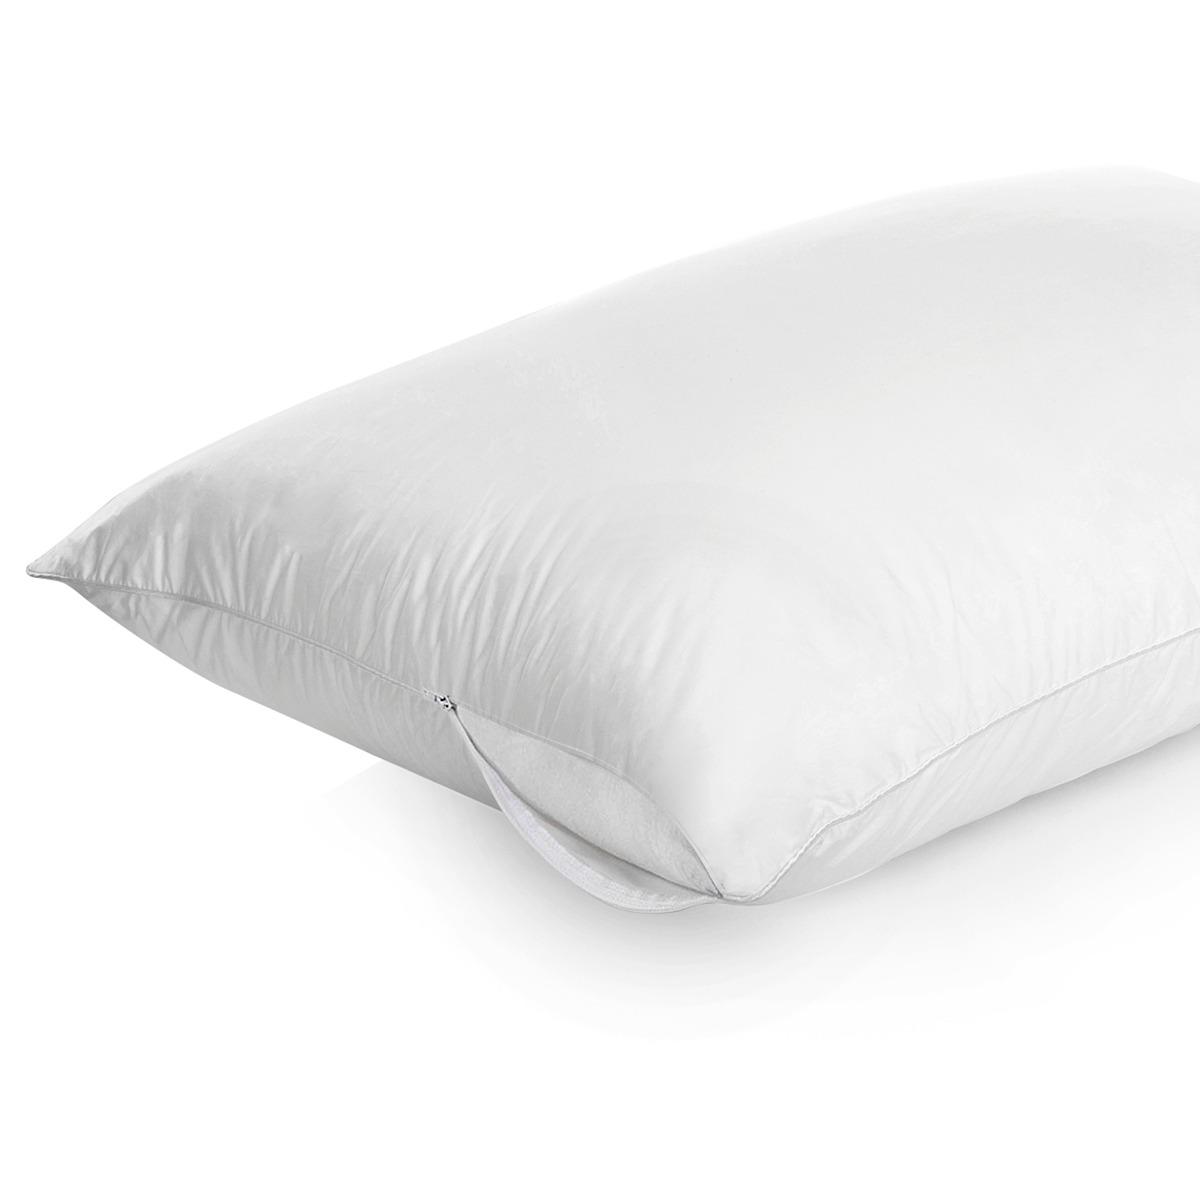 Protetor para Travesseiro Impermeavel Cameba Branco - Vida Pratika